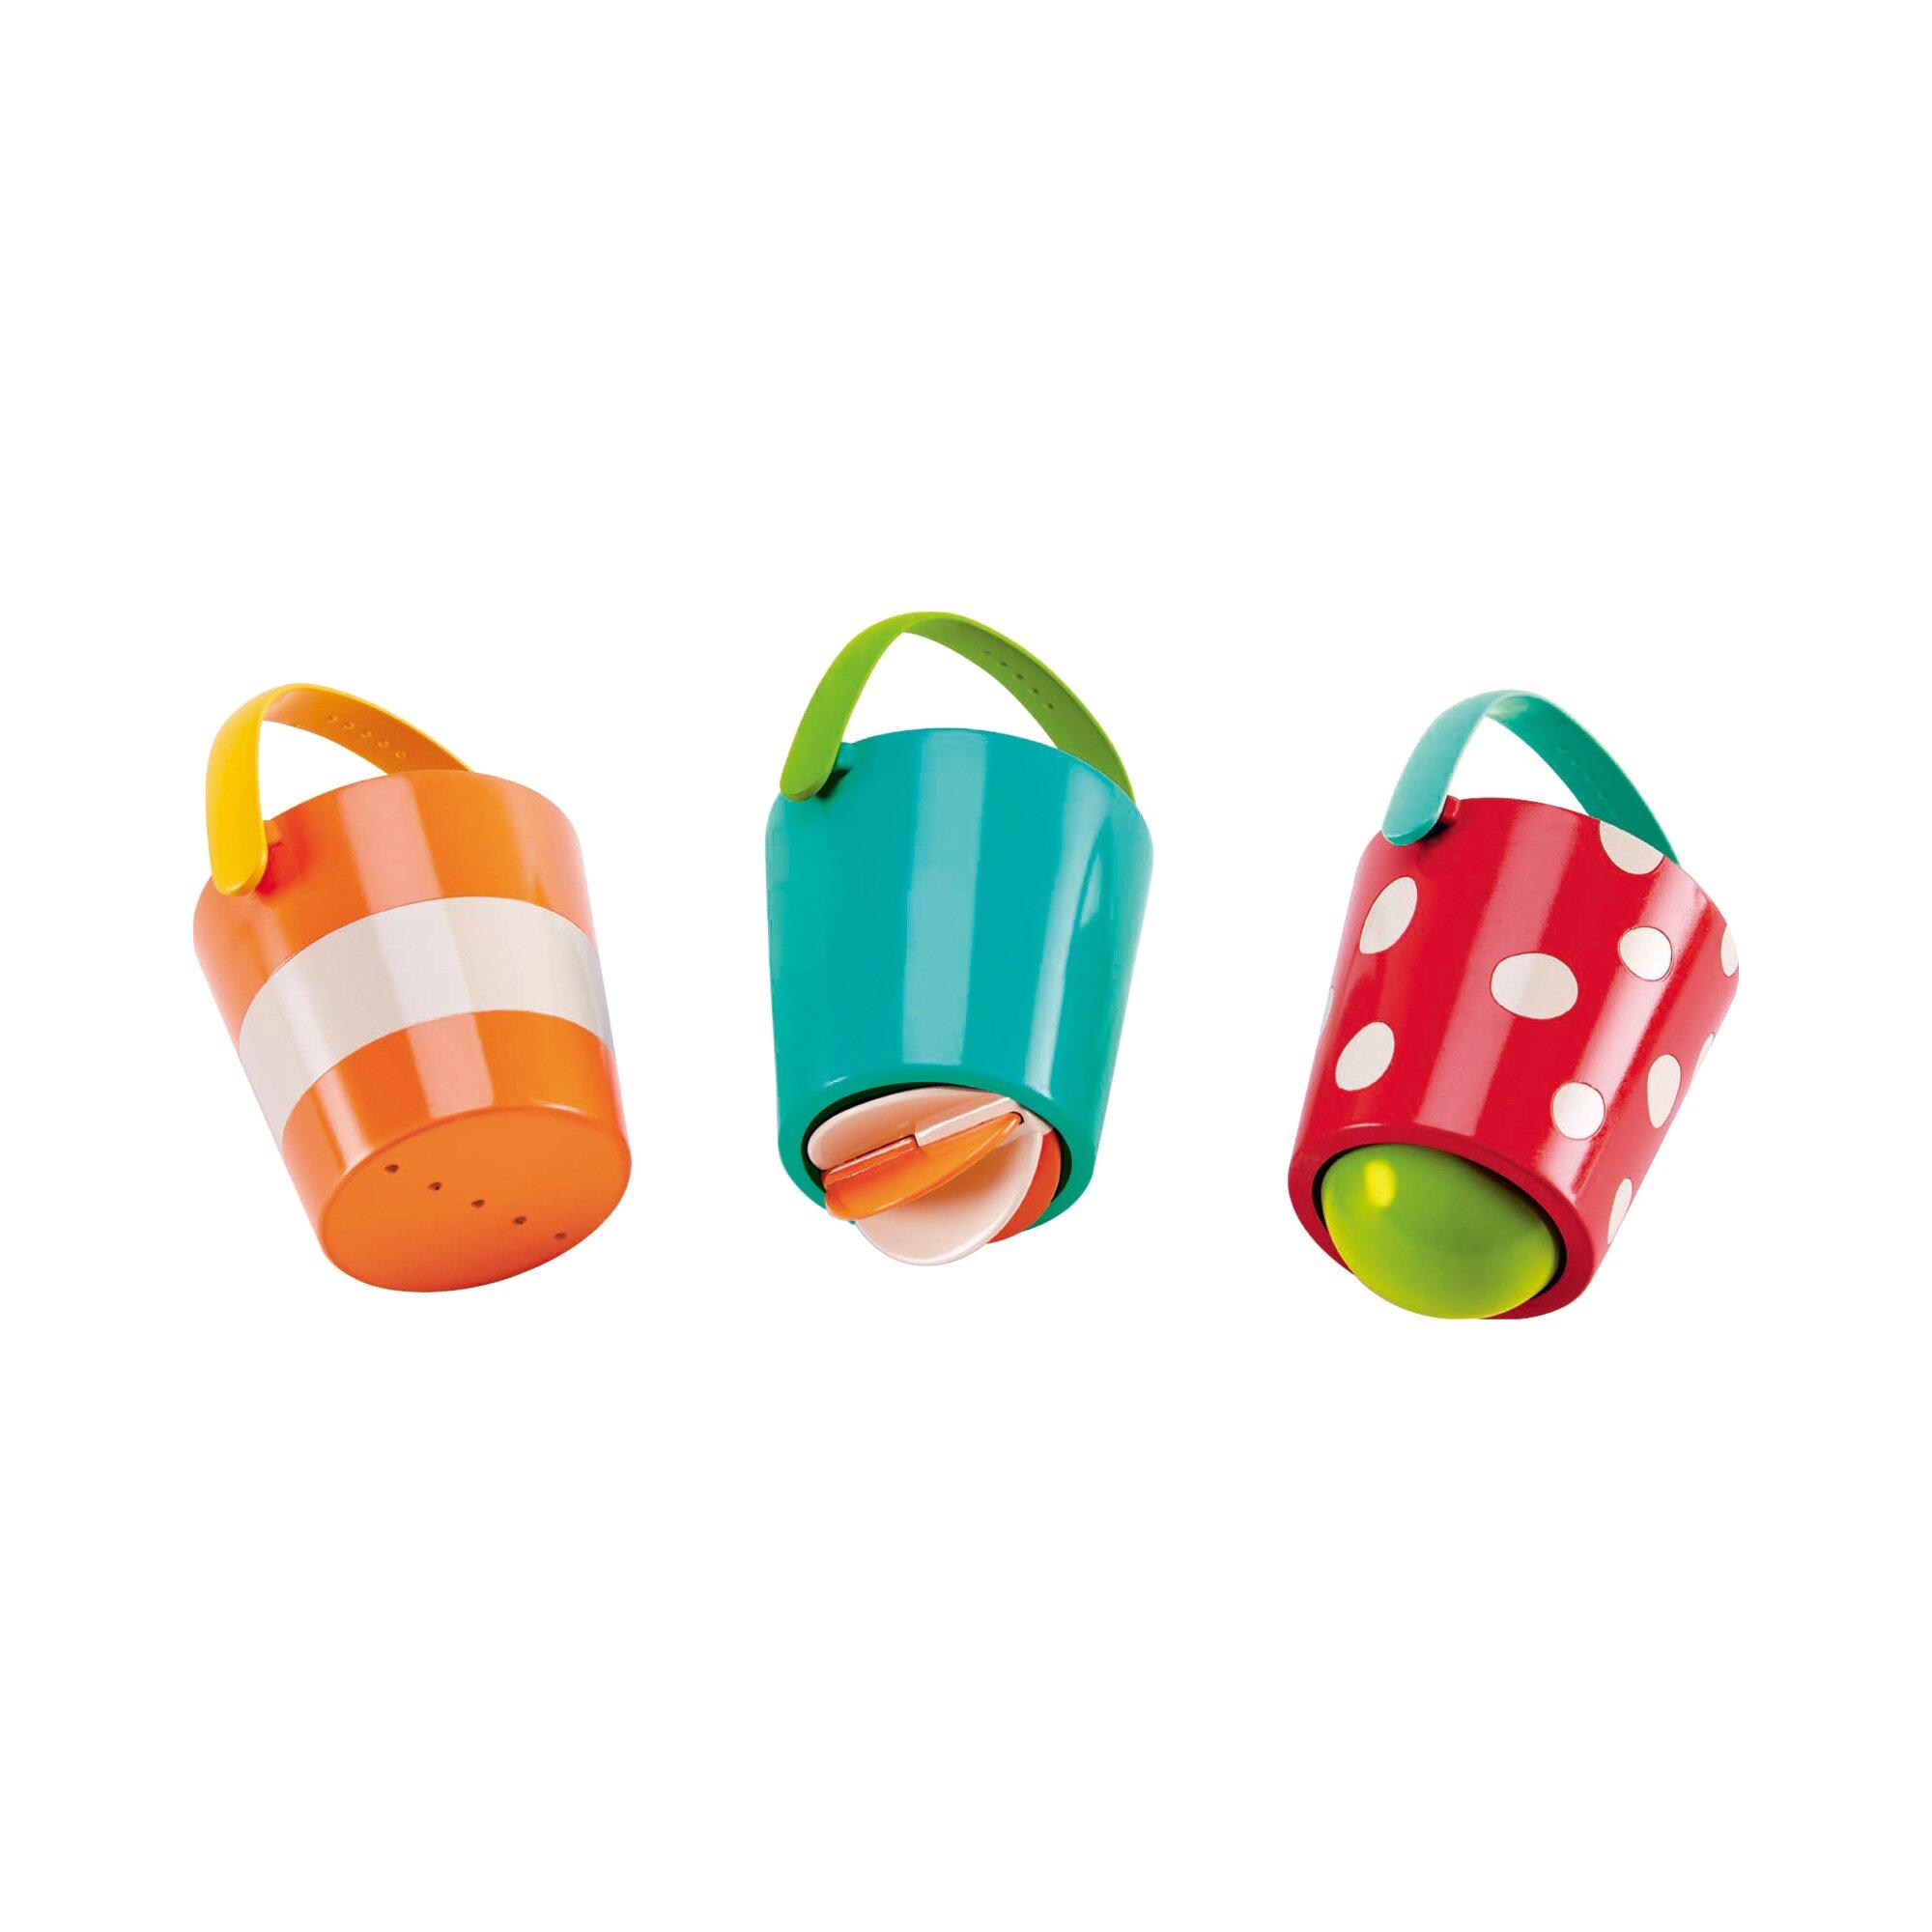 Hape Badespielzeug Buntes Eimer-Set